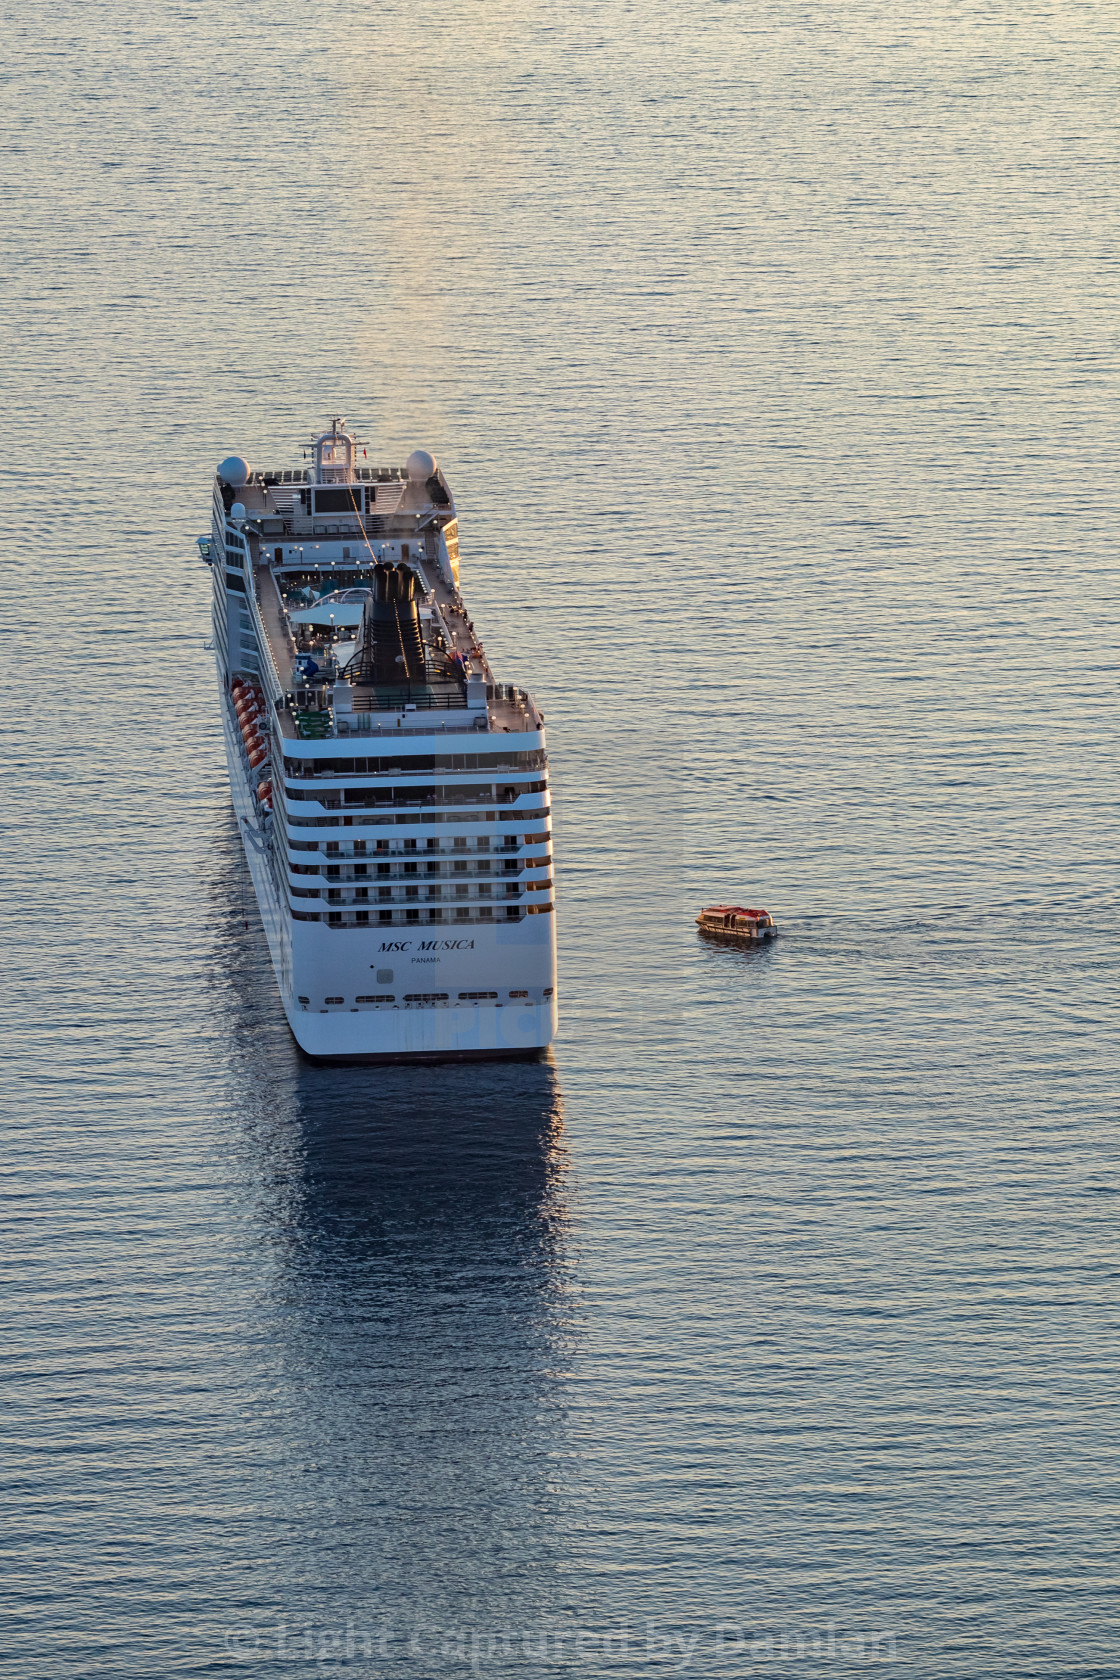 """Cruise ship awaits its passengers,evening,Albania"" stock image"